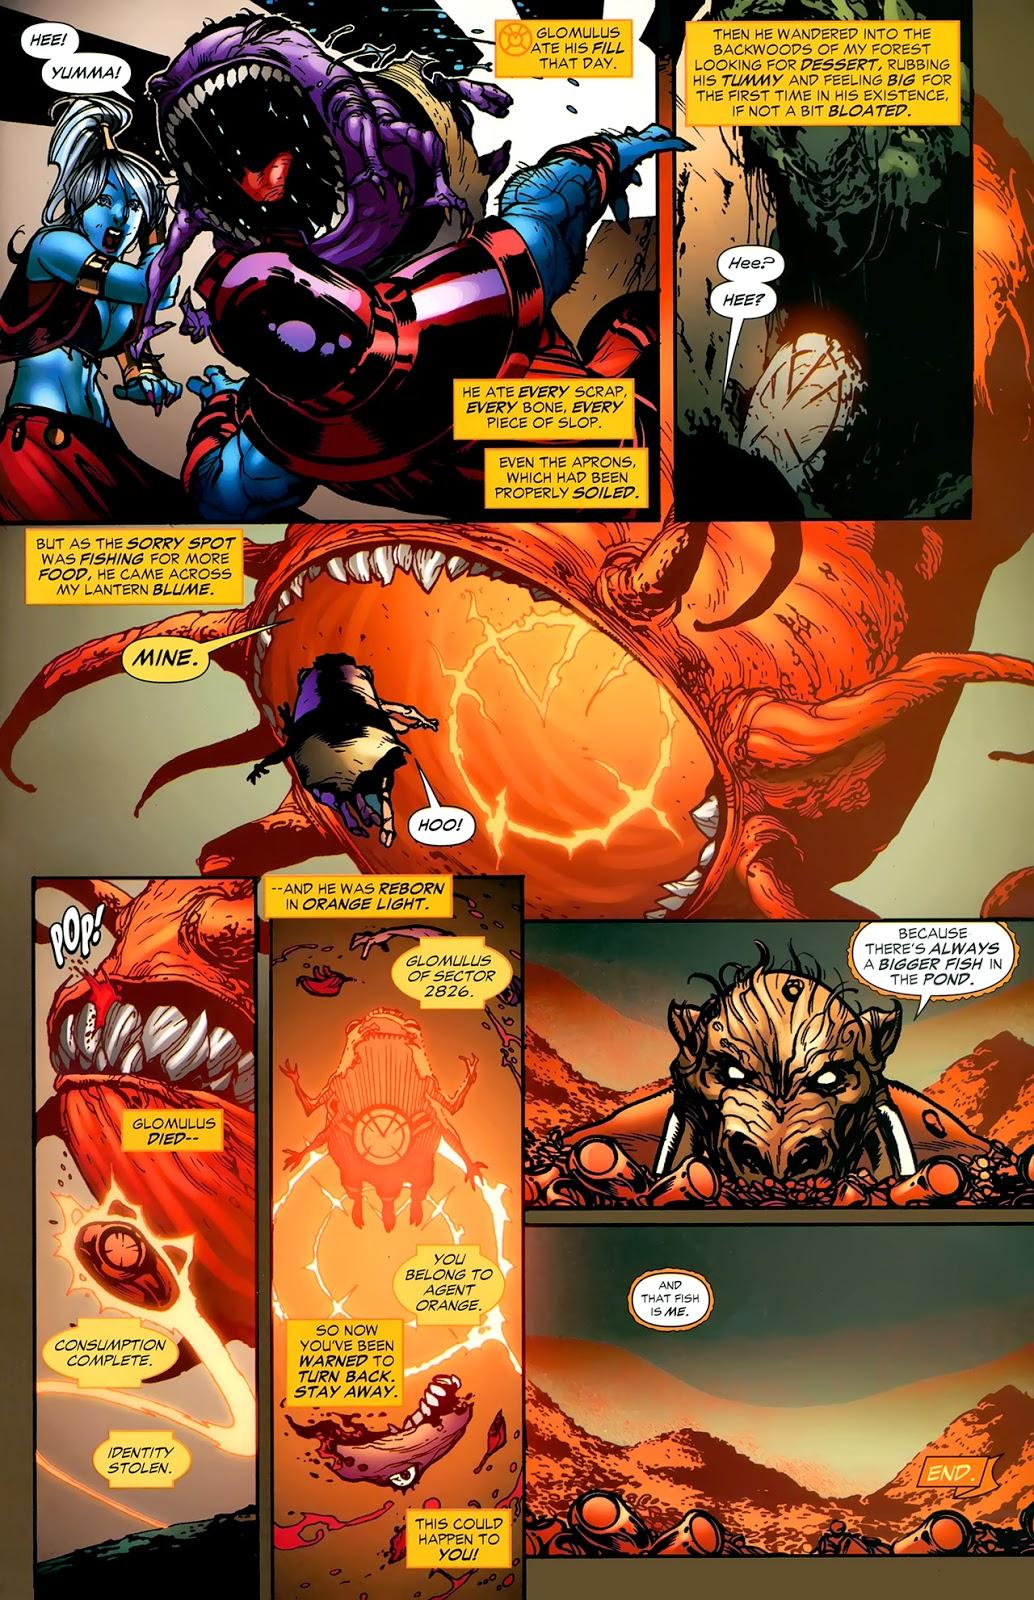 How Glomulus Became An Orange Lantern